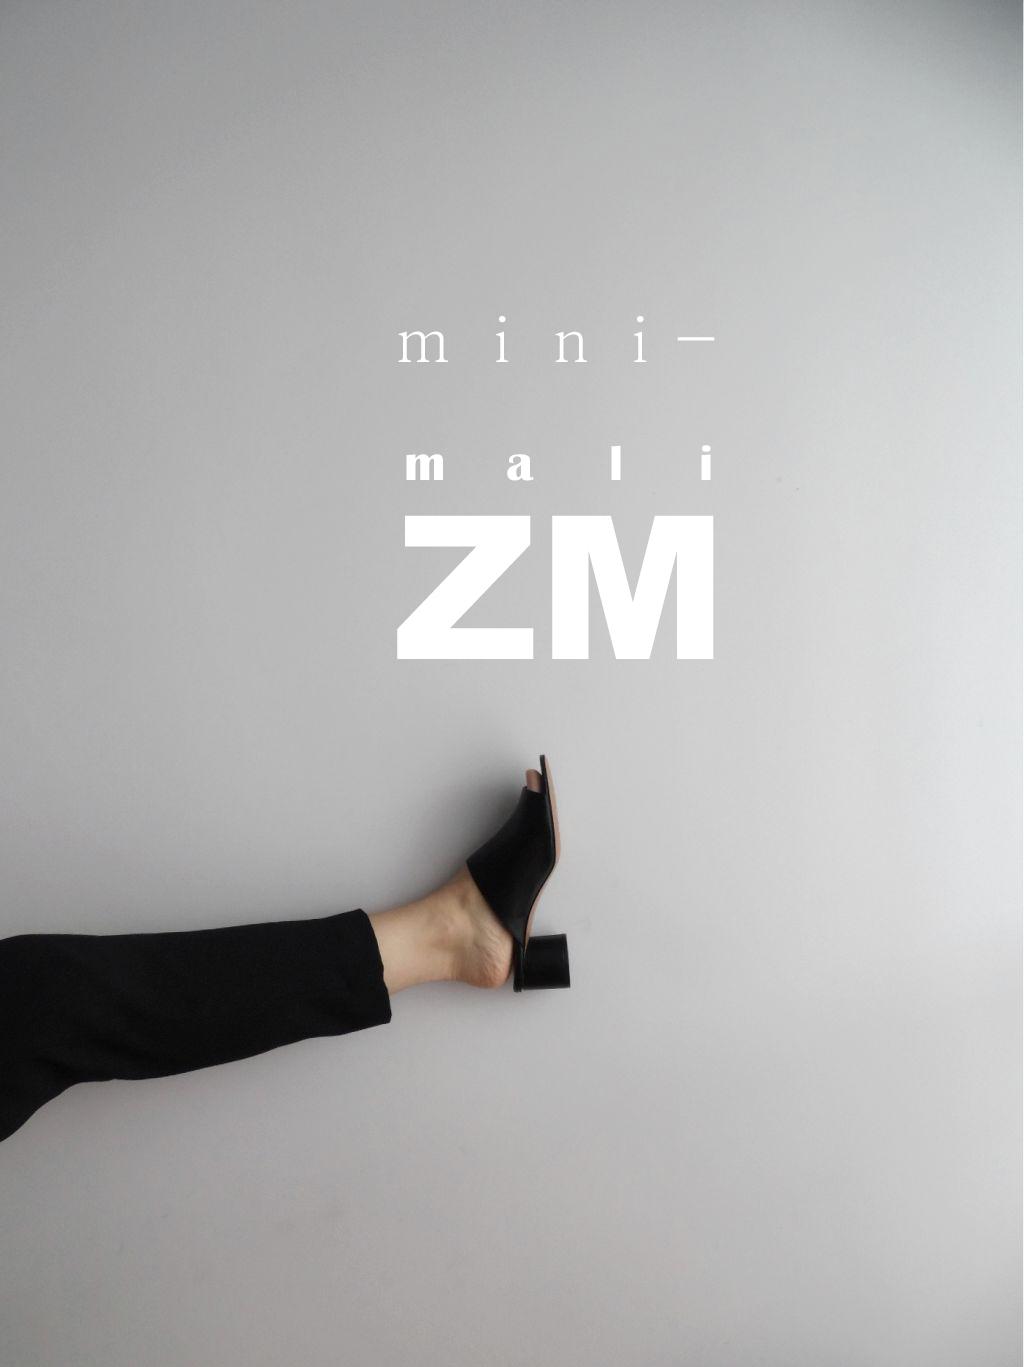 MInimalizm - po minimum?